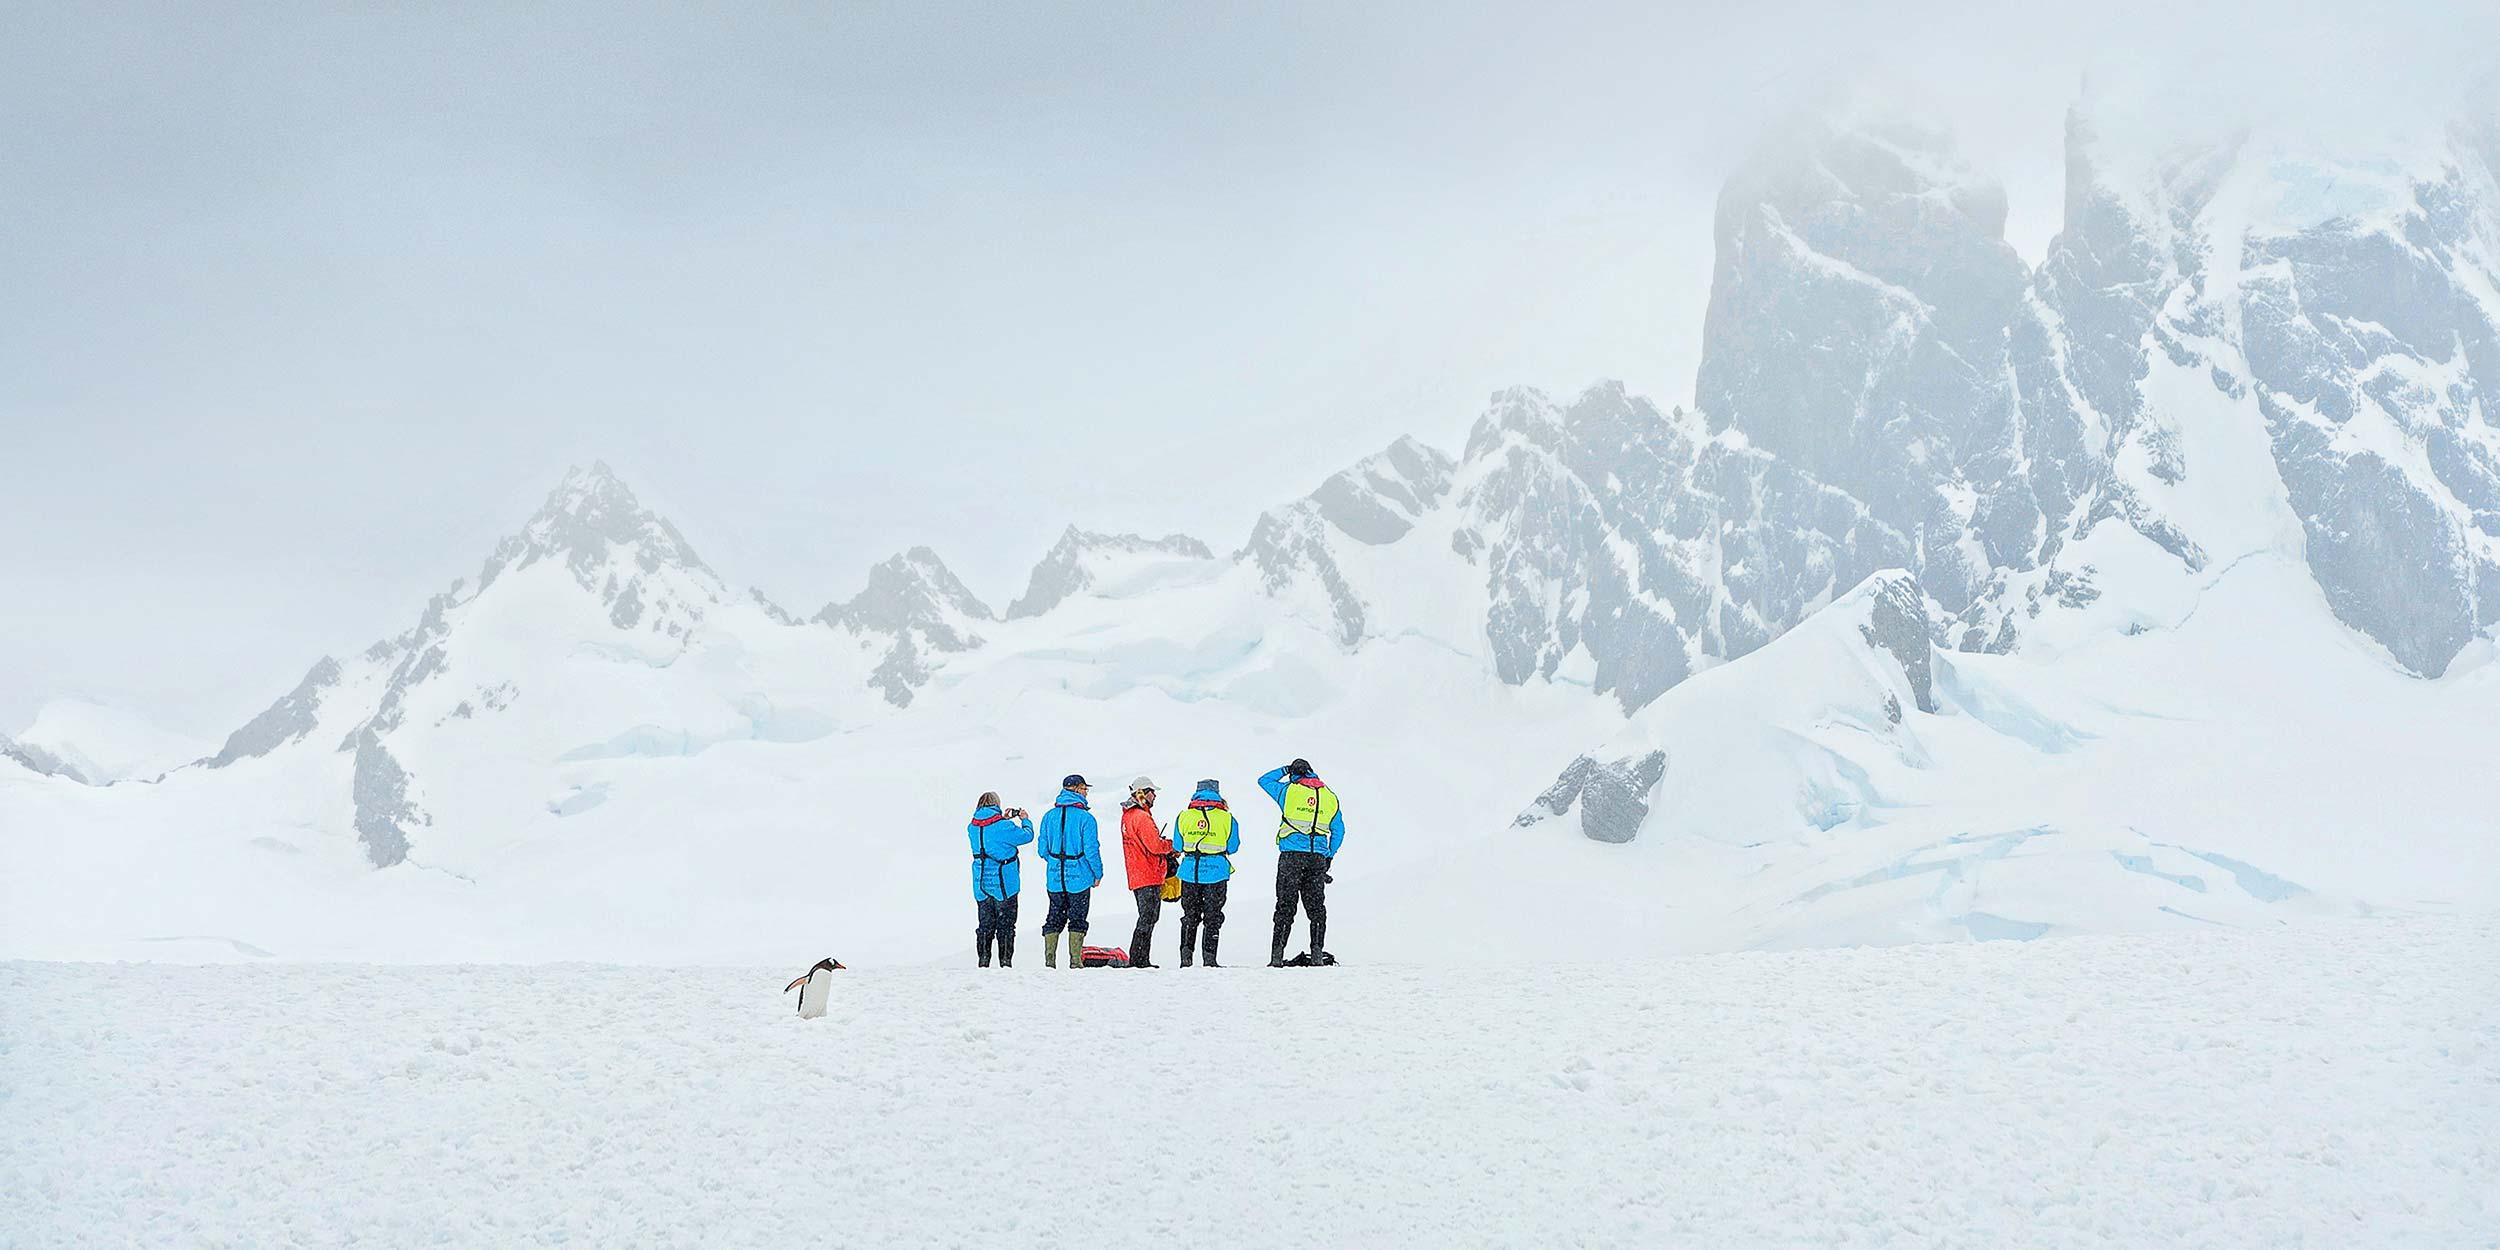 L' Bagages Pour Antarctique Hurtigruten Que Fr Prendre rqtrO